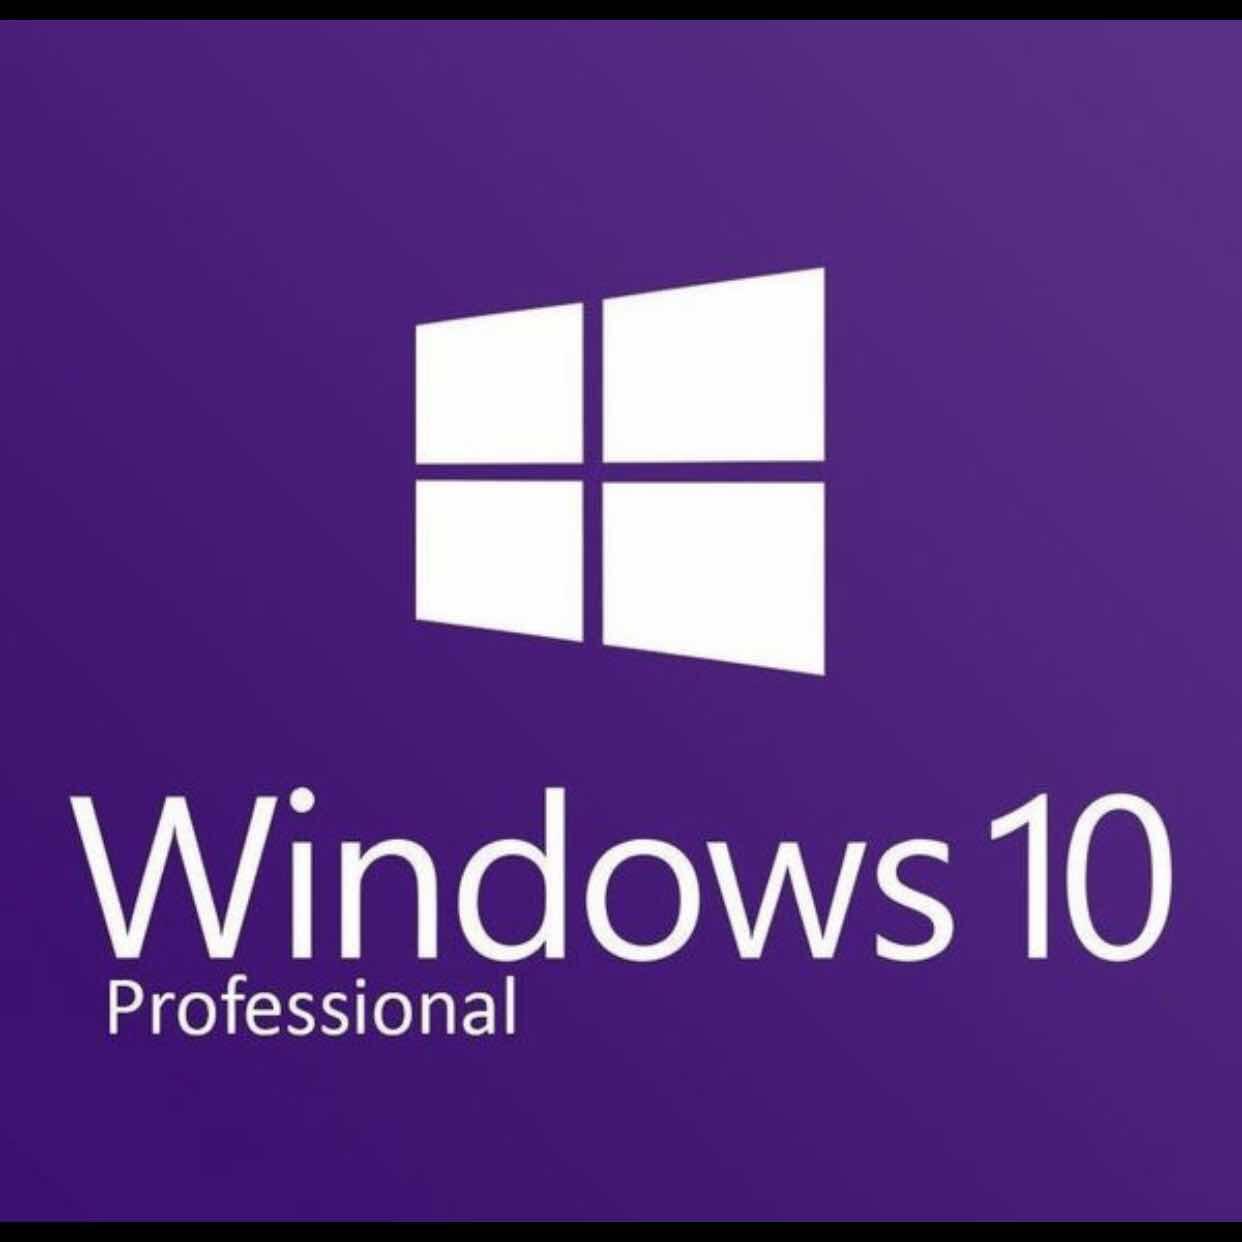 Windows 10 Professional Pro License Key